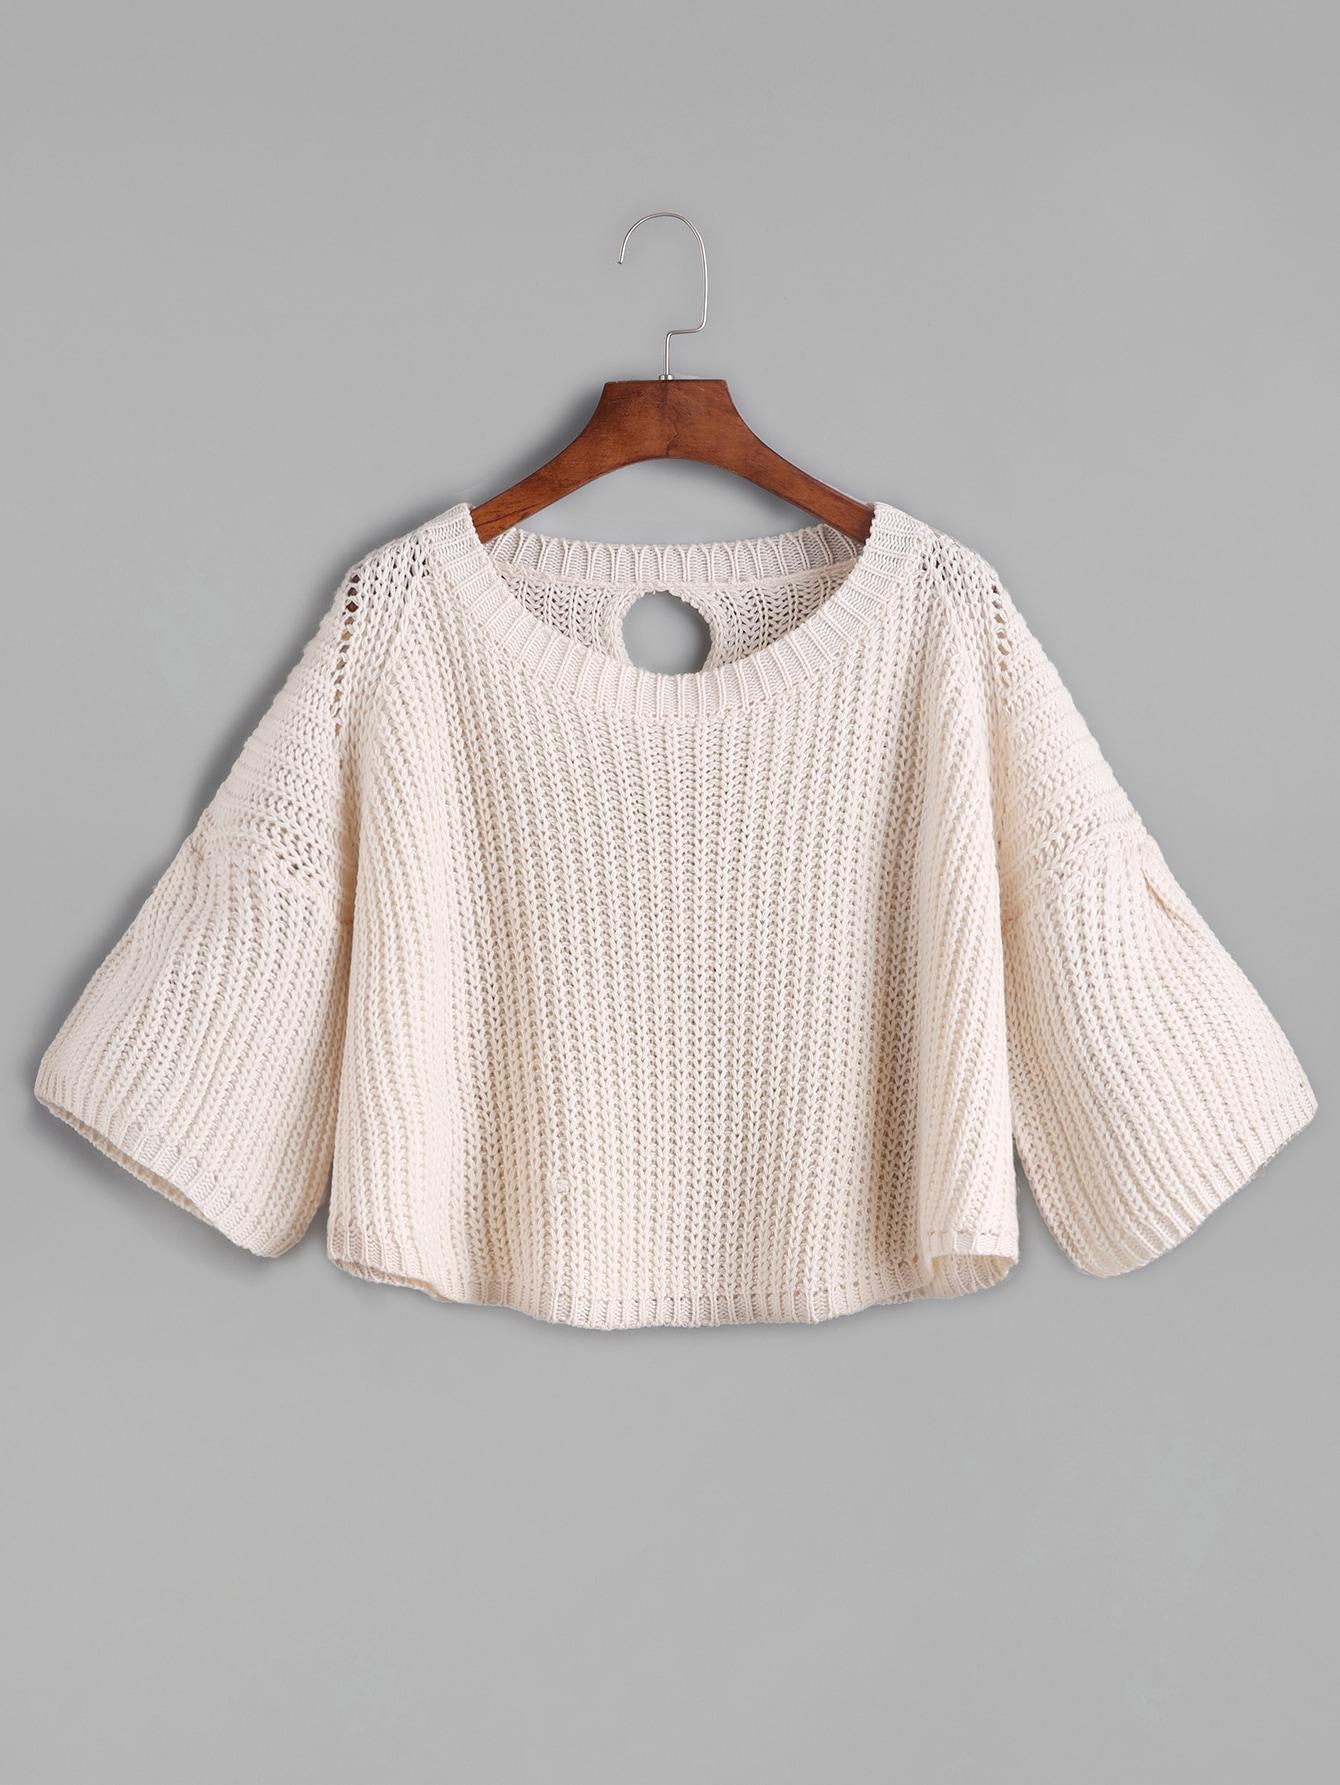 sweater160920469_2